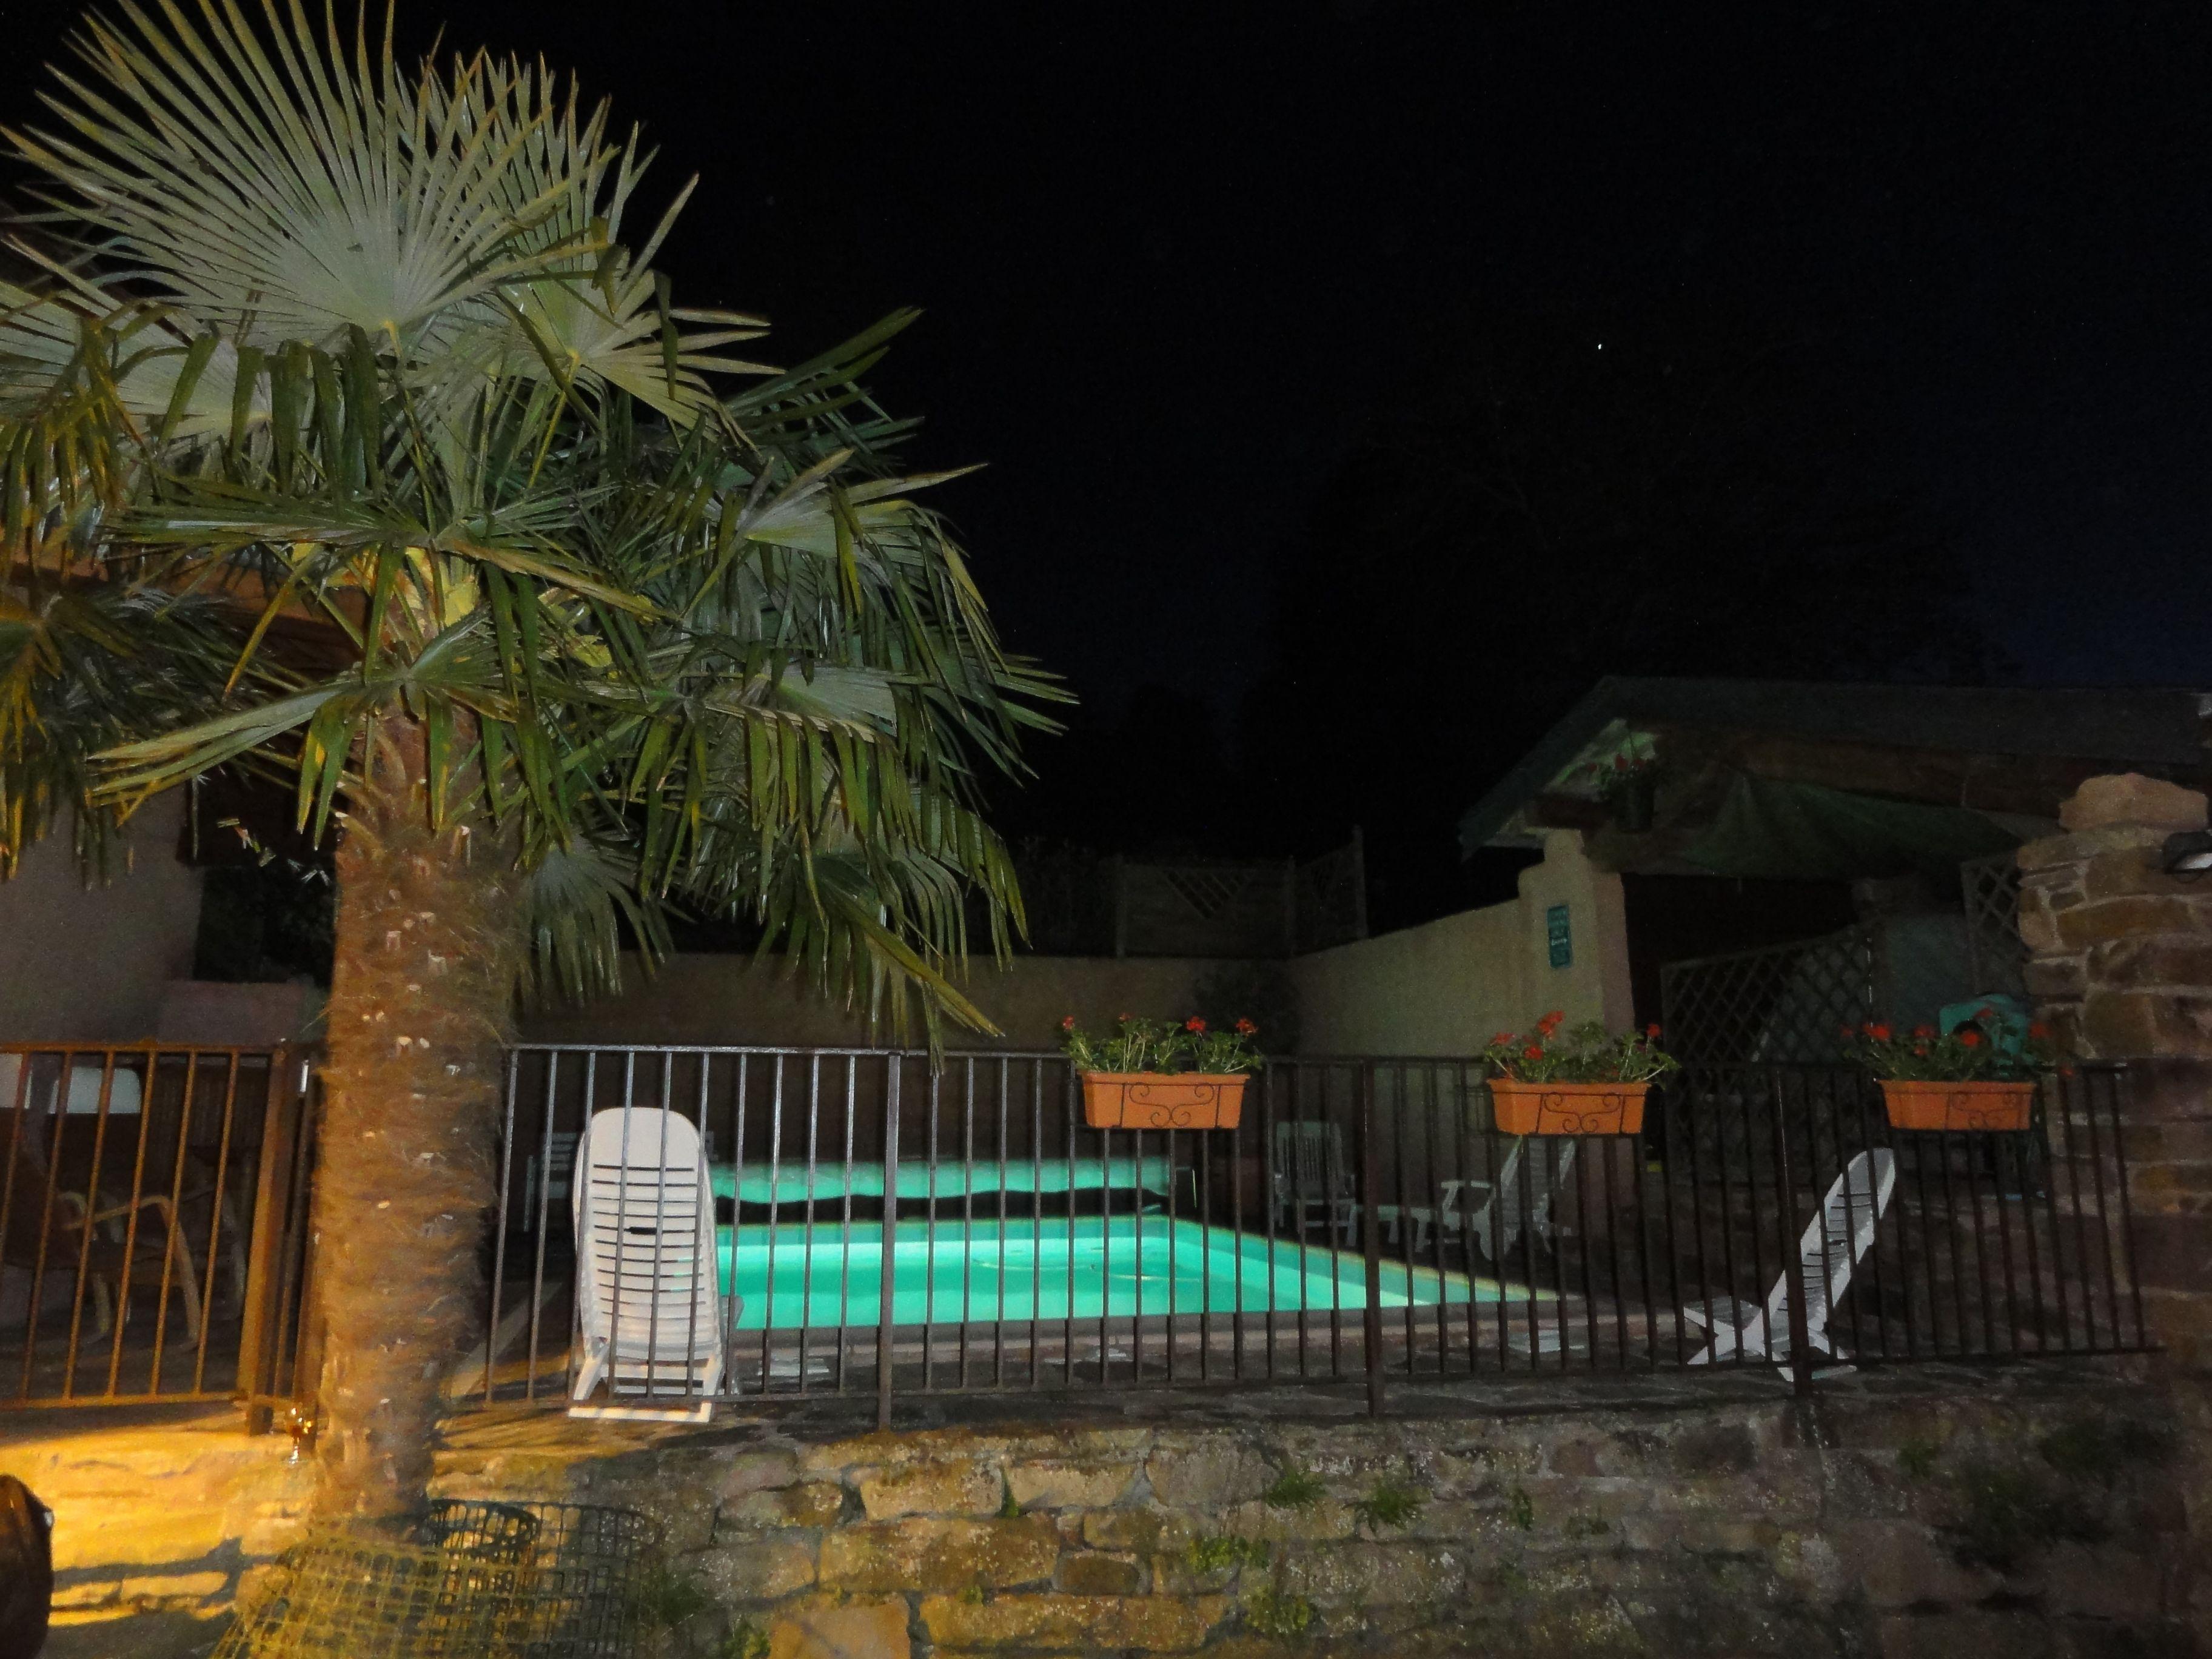 Le soir au bord de la piscine